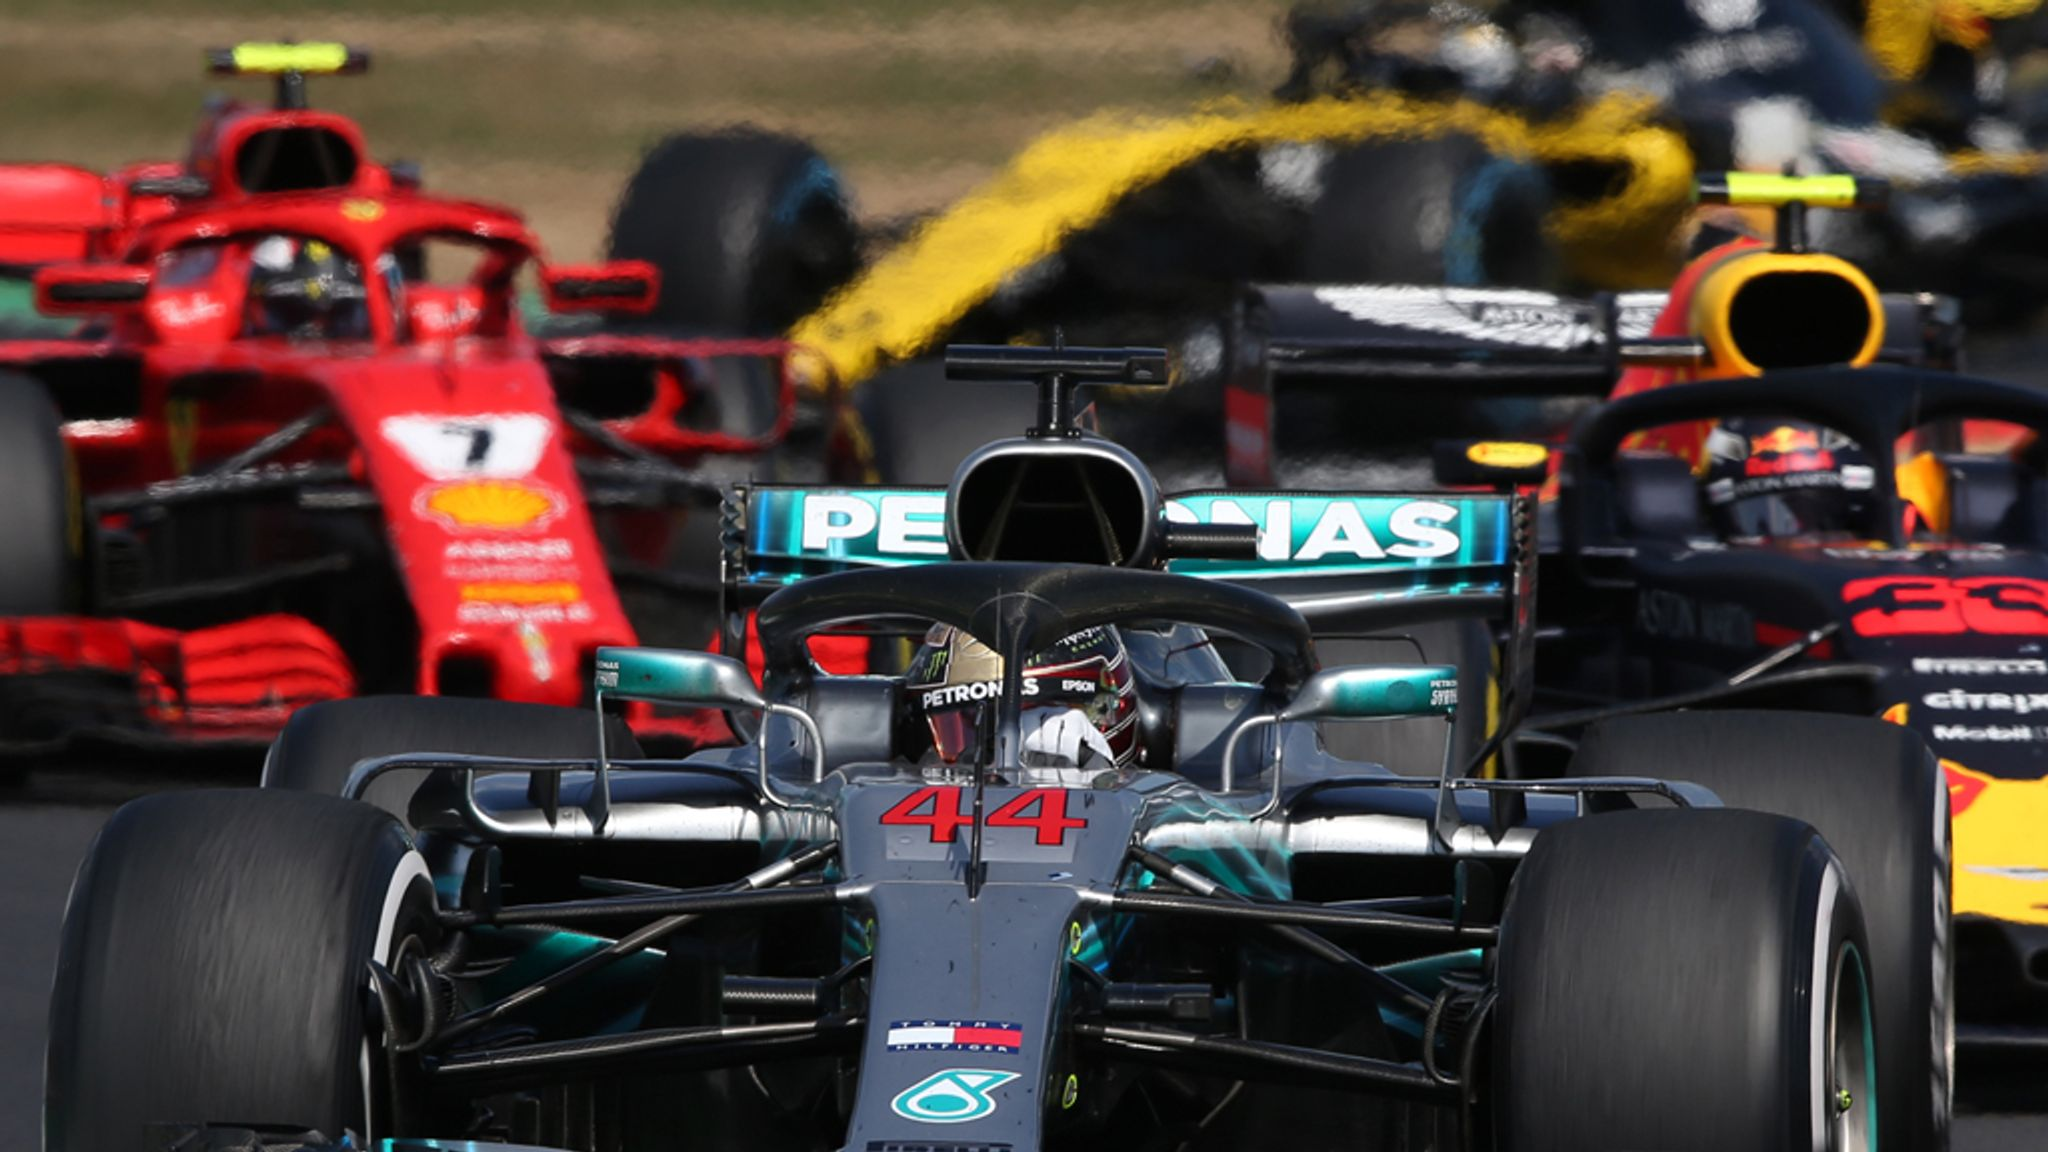 Calendario Test F1 2020.F1 2019 Schedule 21 Race Calendar And December Finish F1 News